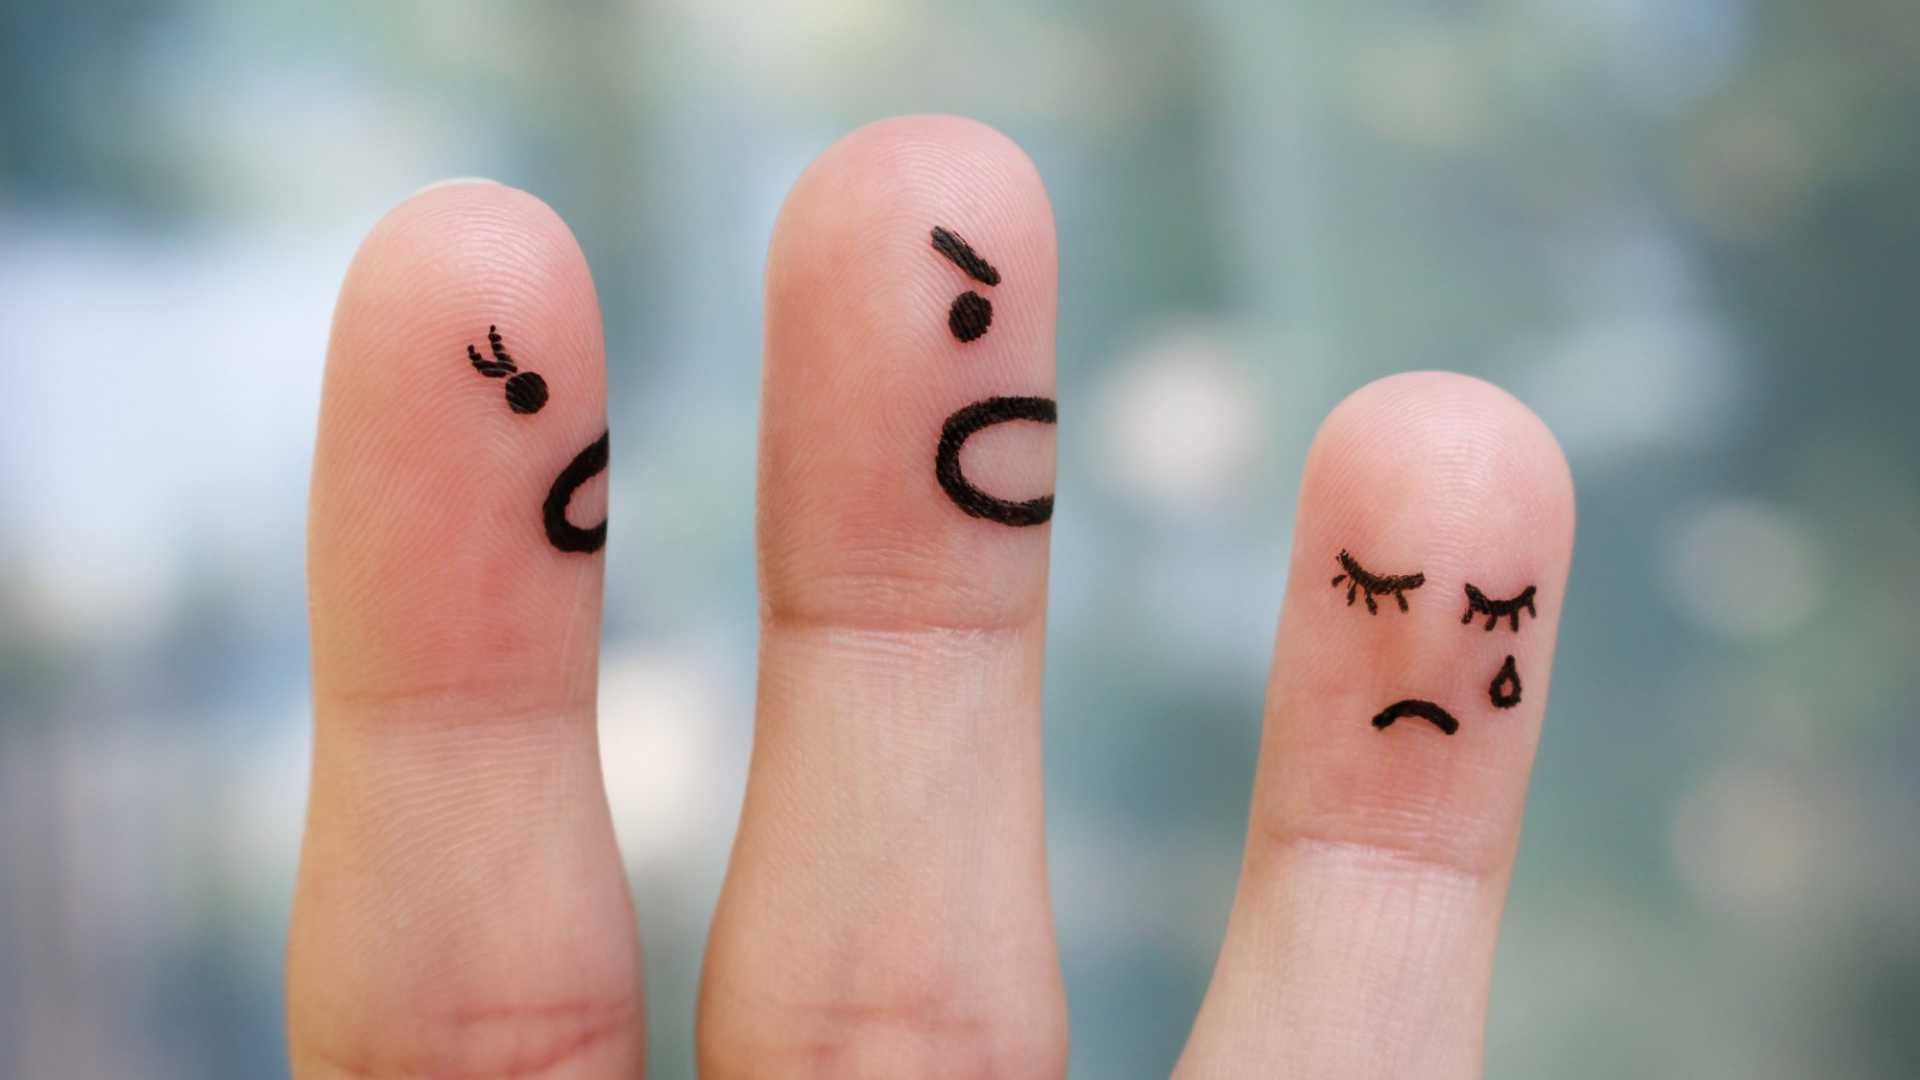 7 Regrets of a Failed Entrepreneur